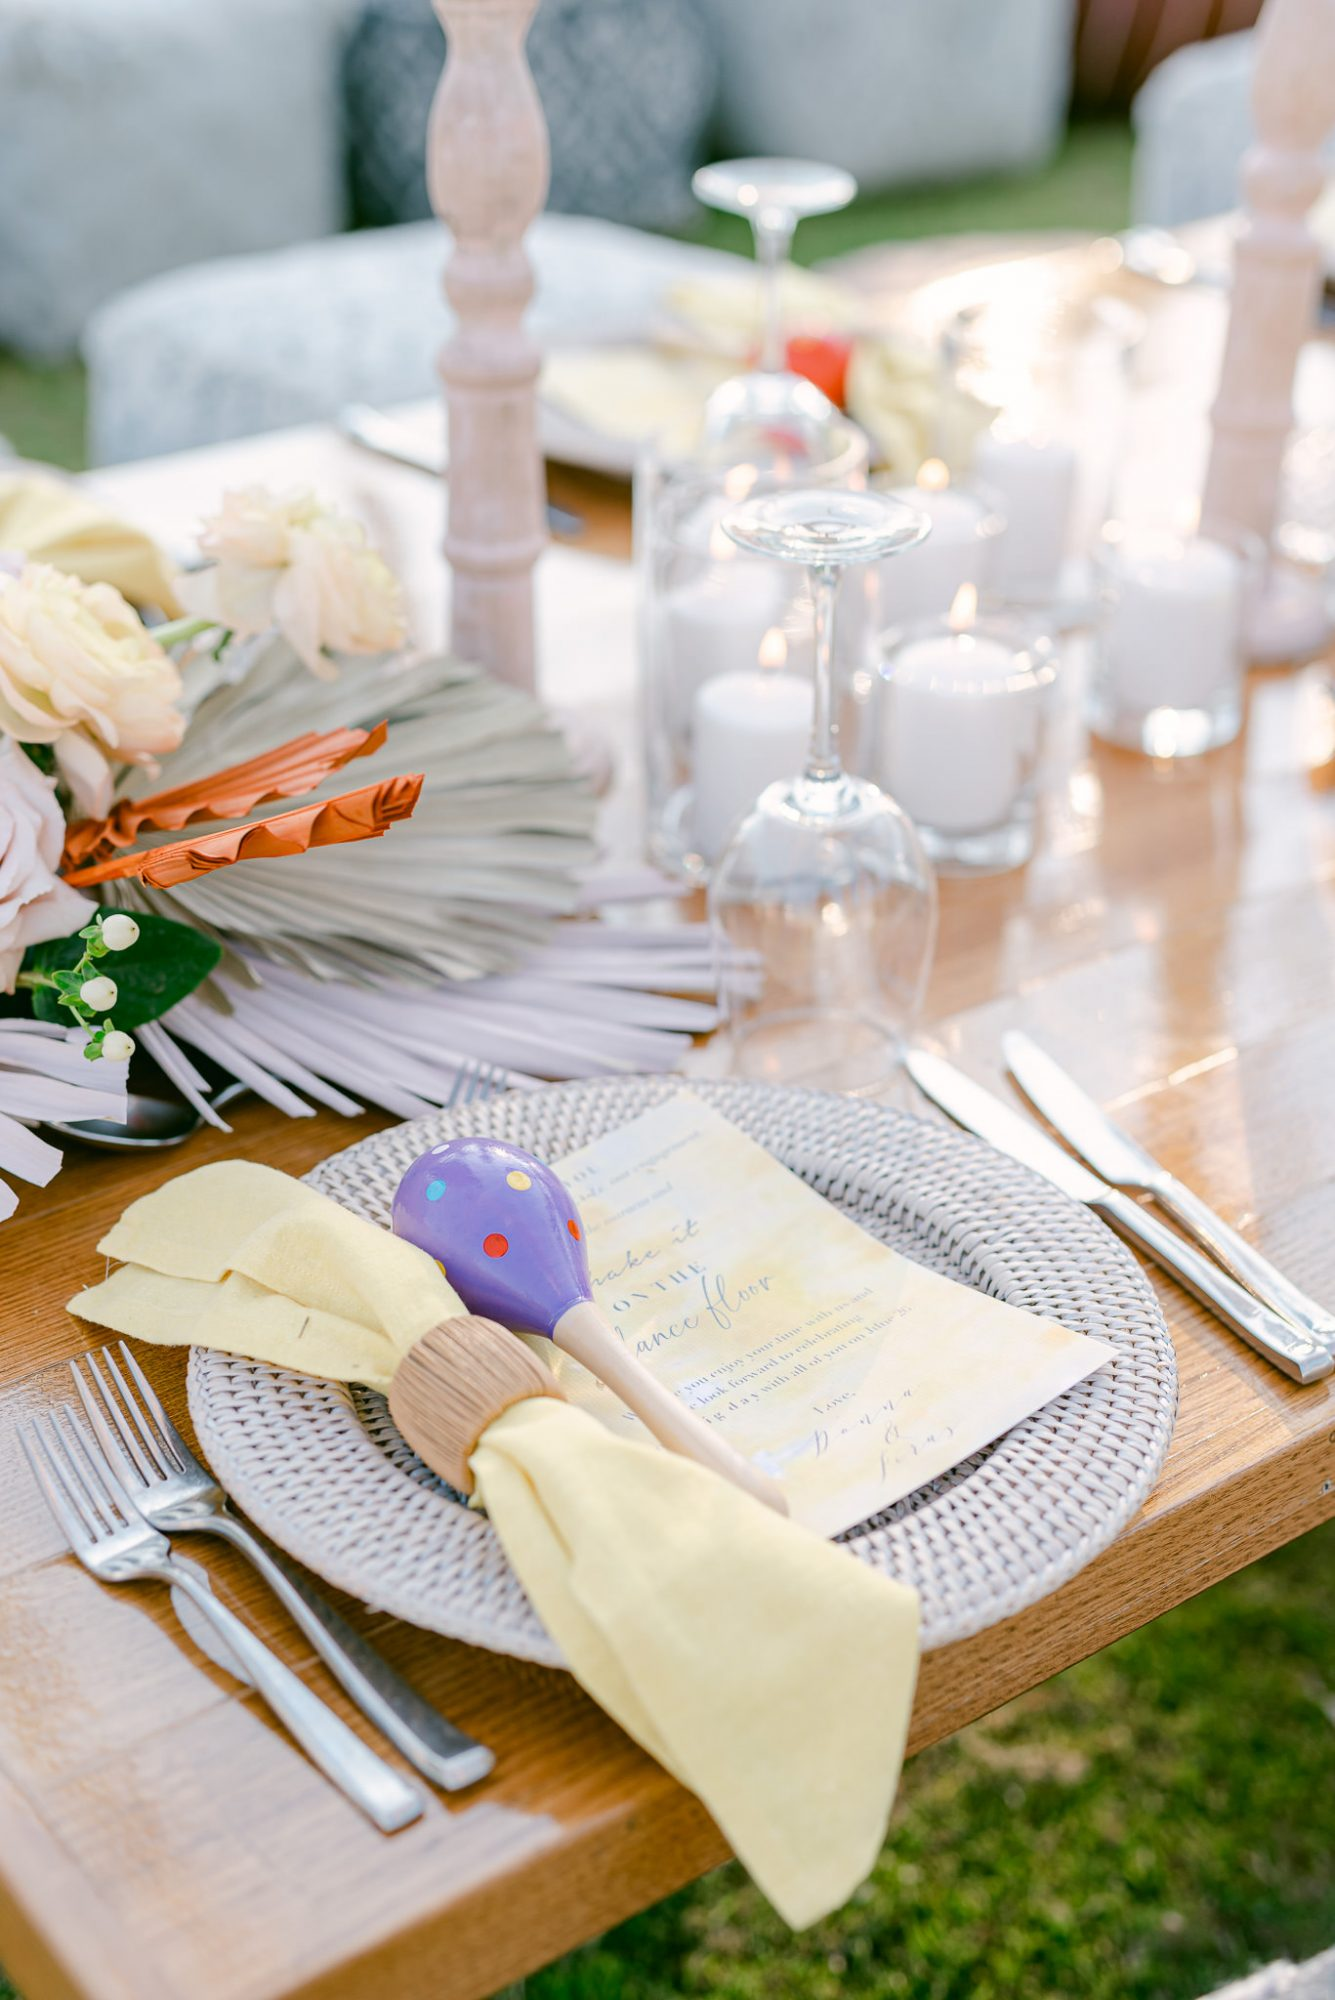 wedding place settings with maraca